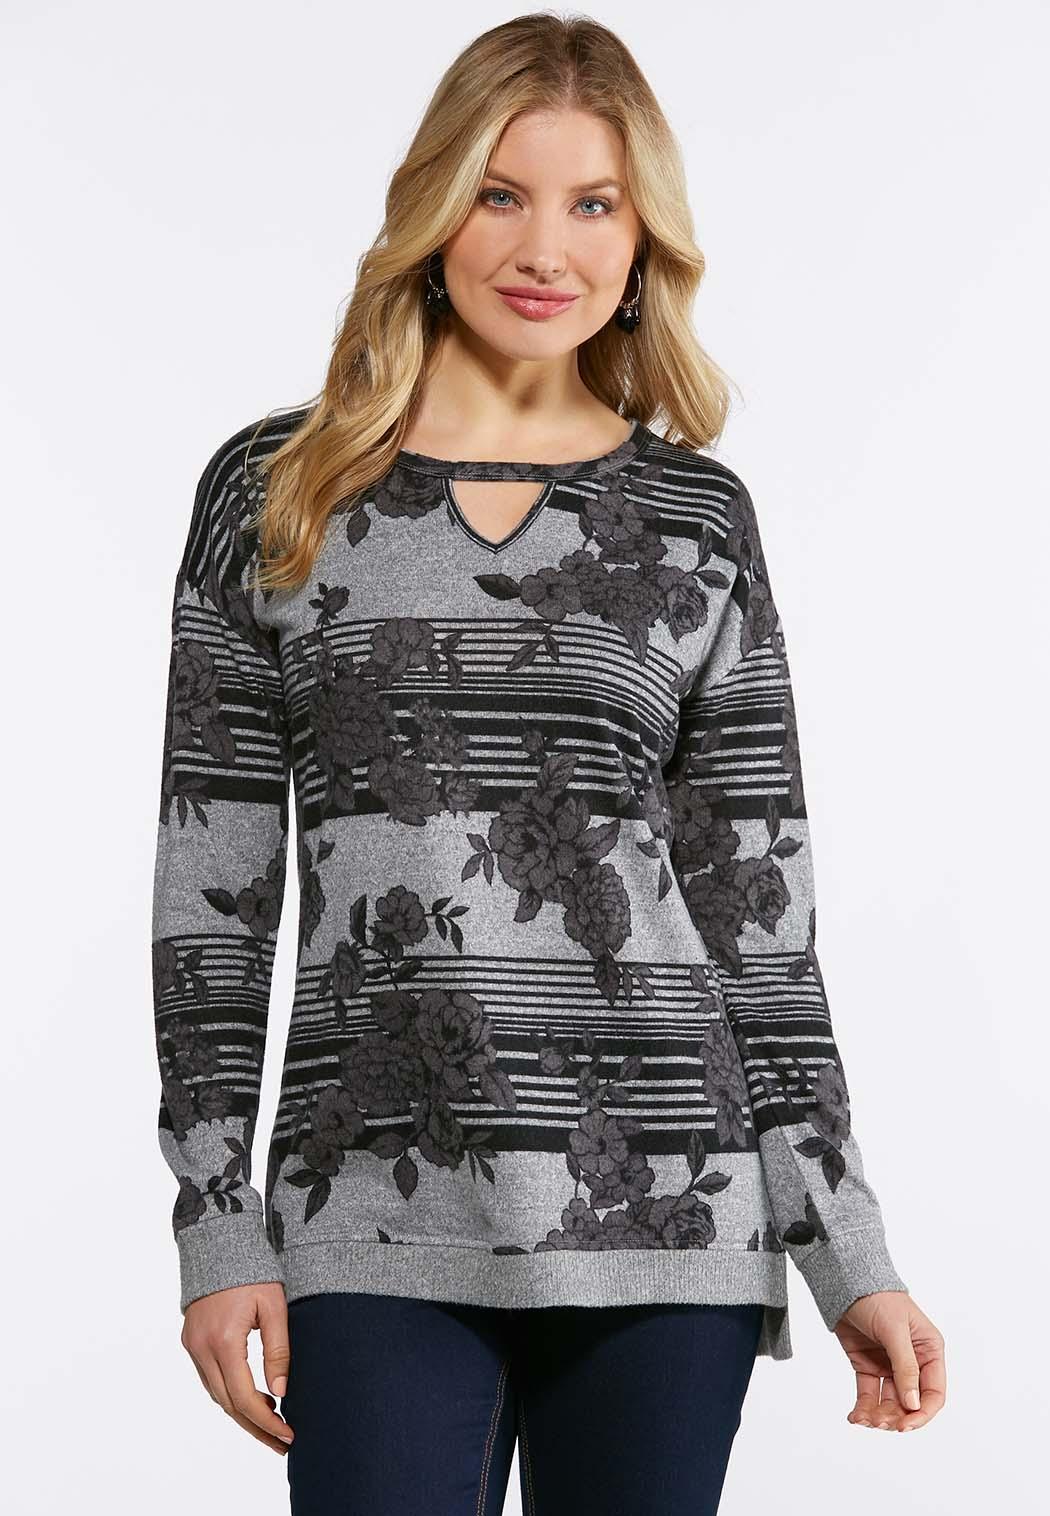 14feb2b506a06 Gray Floral Sweatshirt alternate view · Gray Floral Sweatshirt